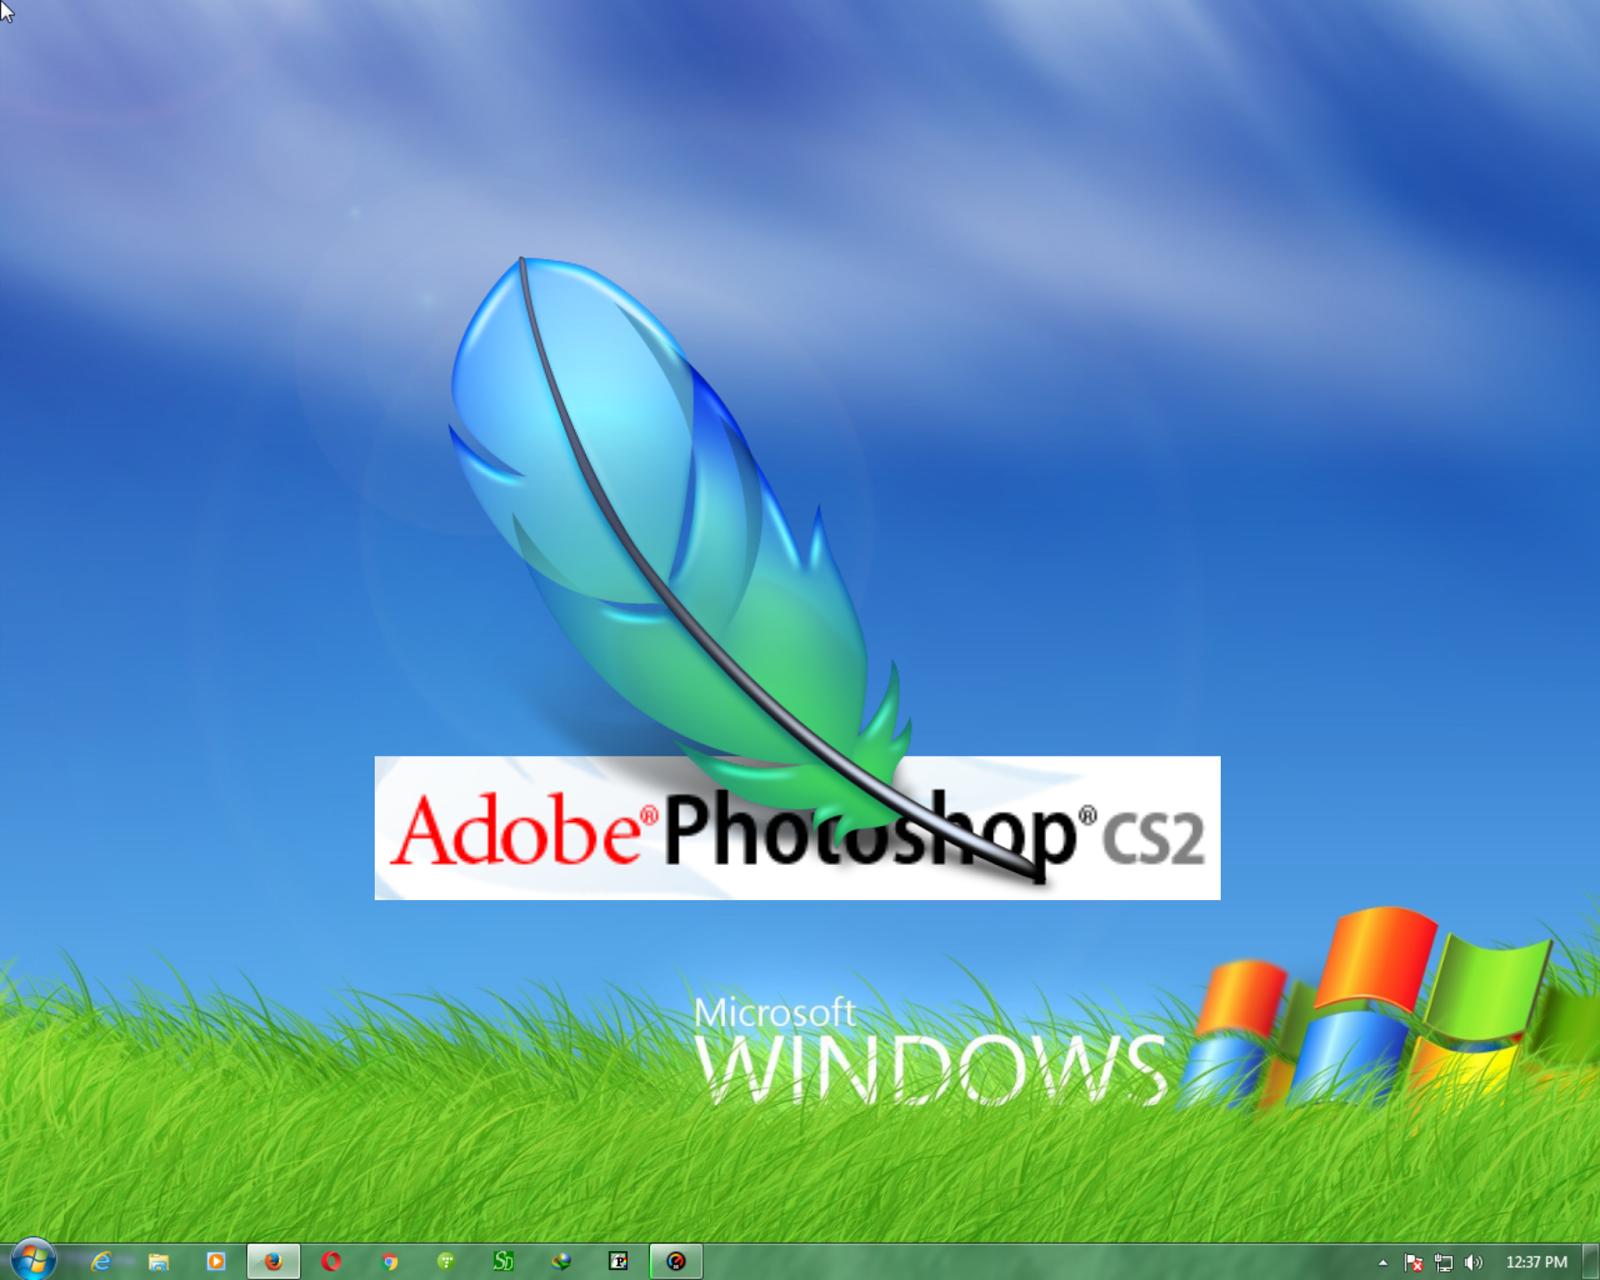 Adobe Photoshop CS2 Full Tutorial in Hindi - Tools For